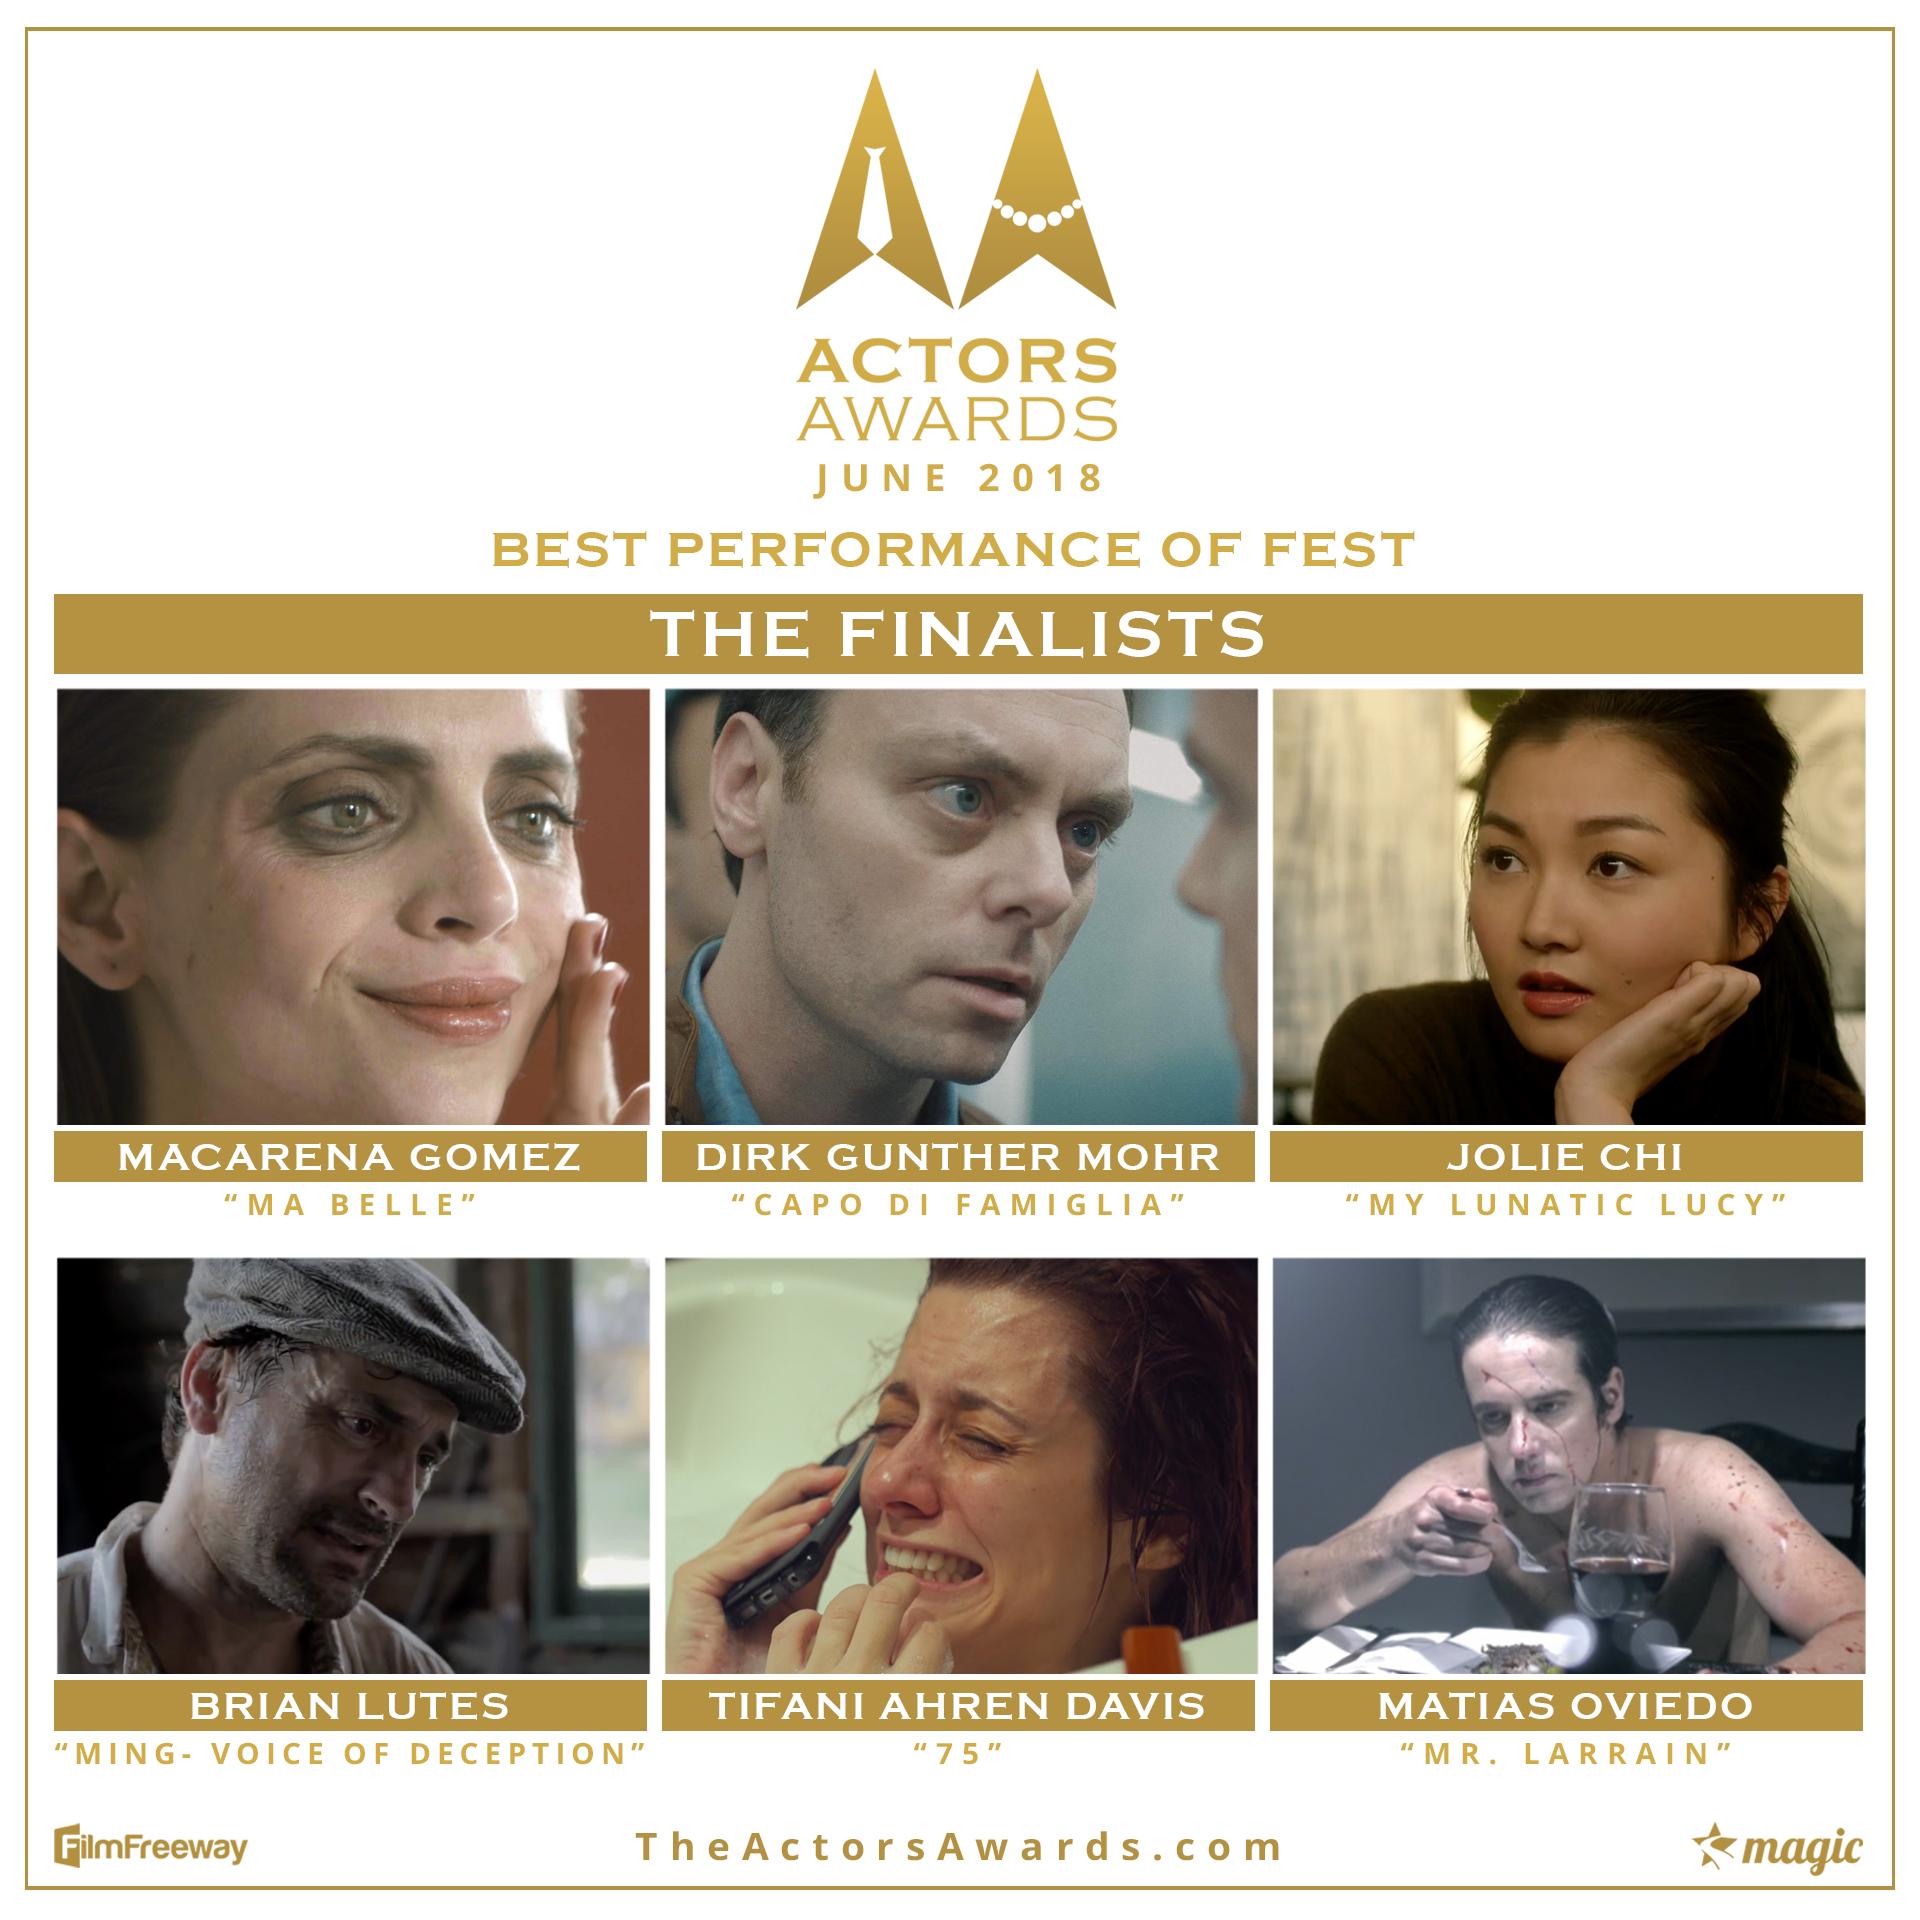 2018 06 finalists